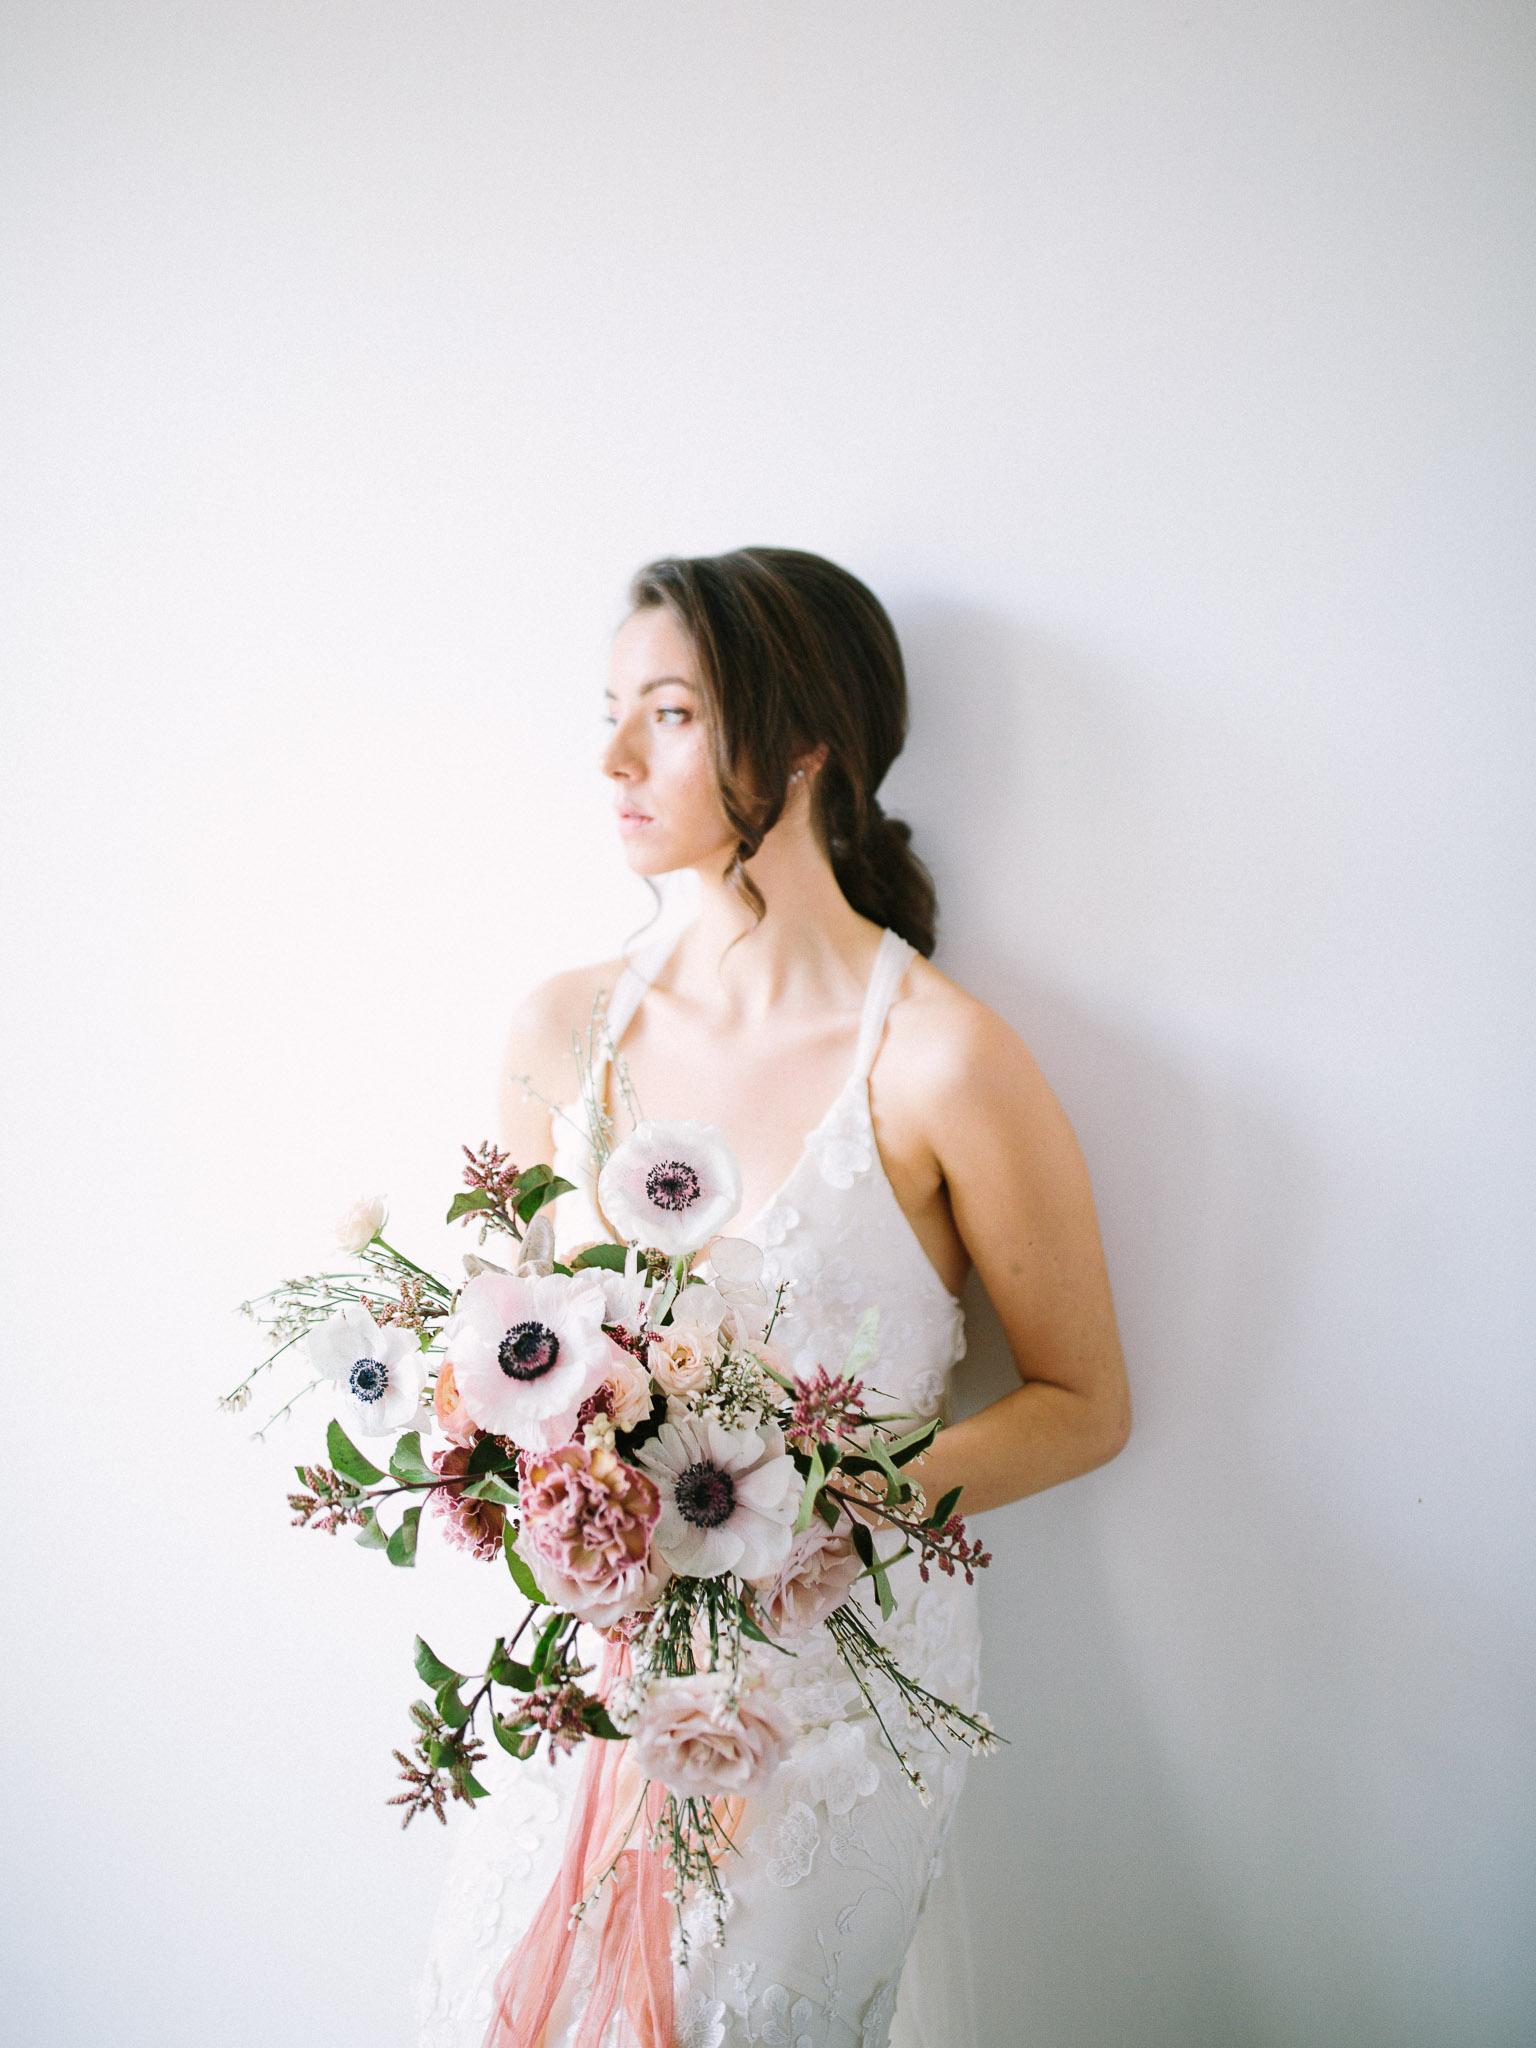 ModernNaturalStyledShoot_MaricleKang_Vancouver Wedding Photographer__0127.jpg